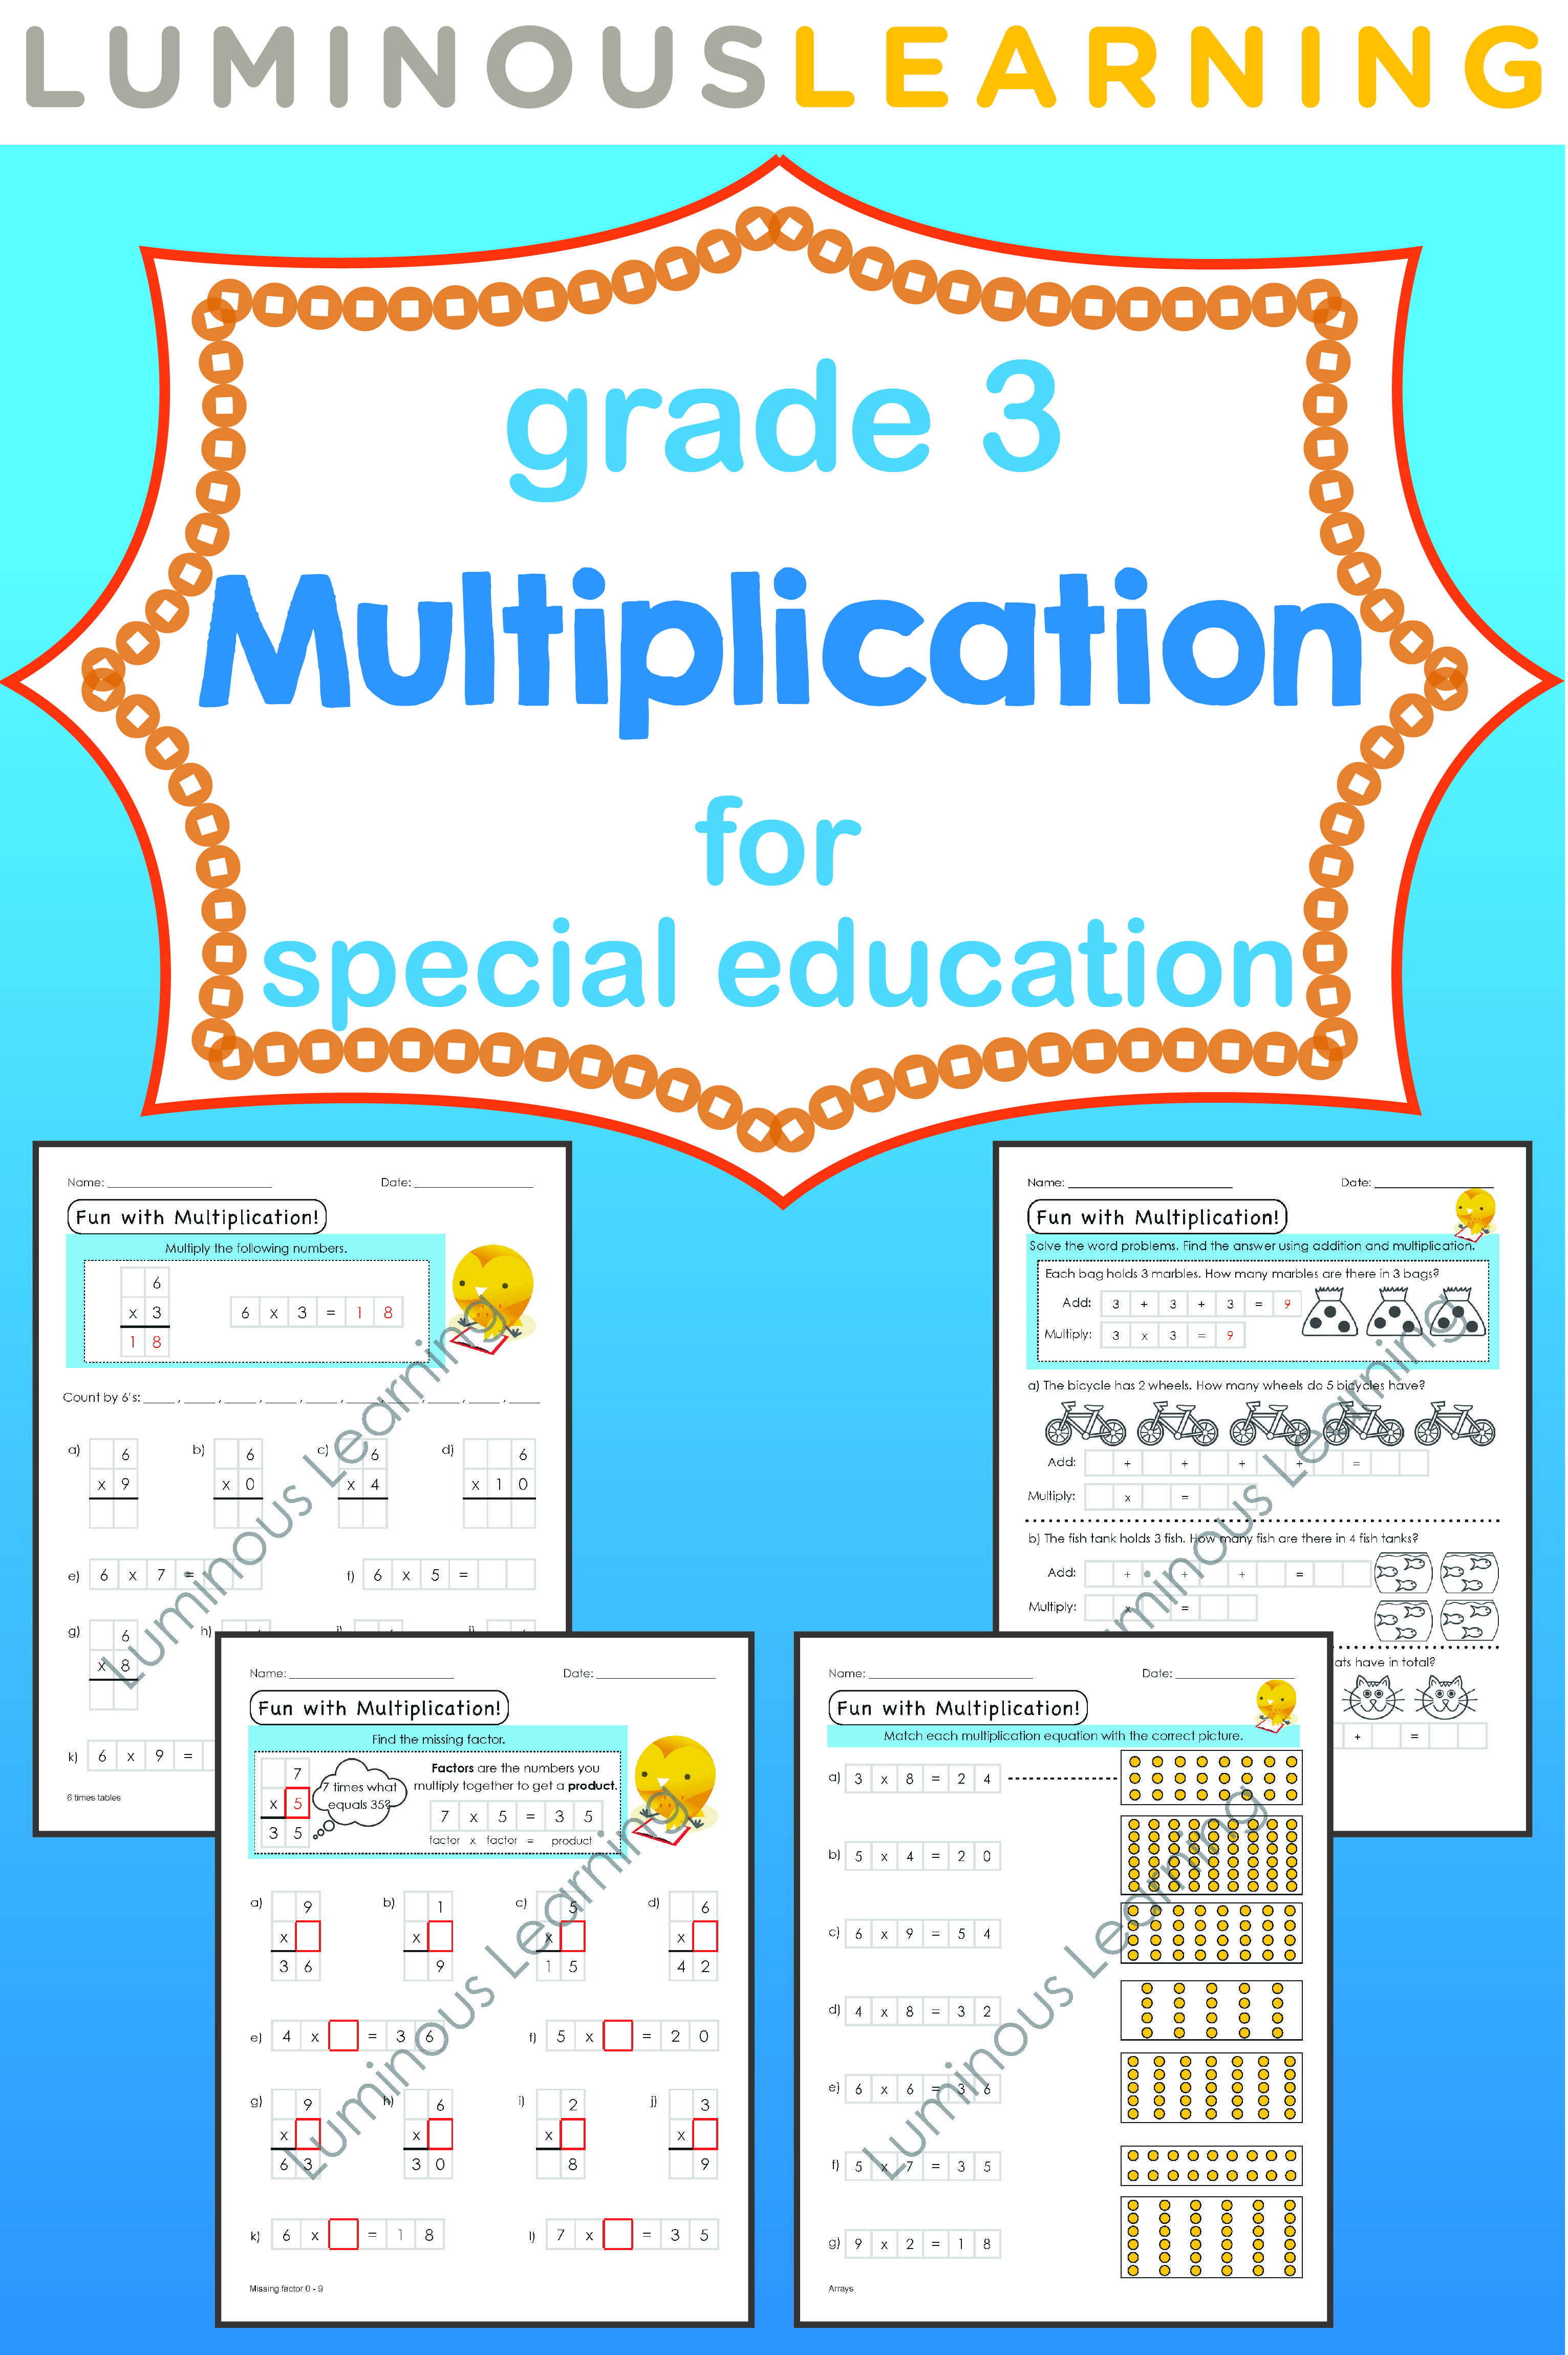 Luminous Learning Grade 3 Multiplication Workbook Empowers